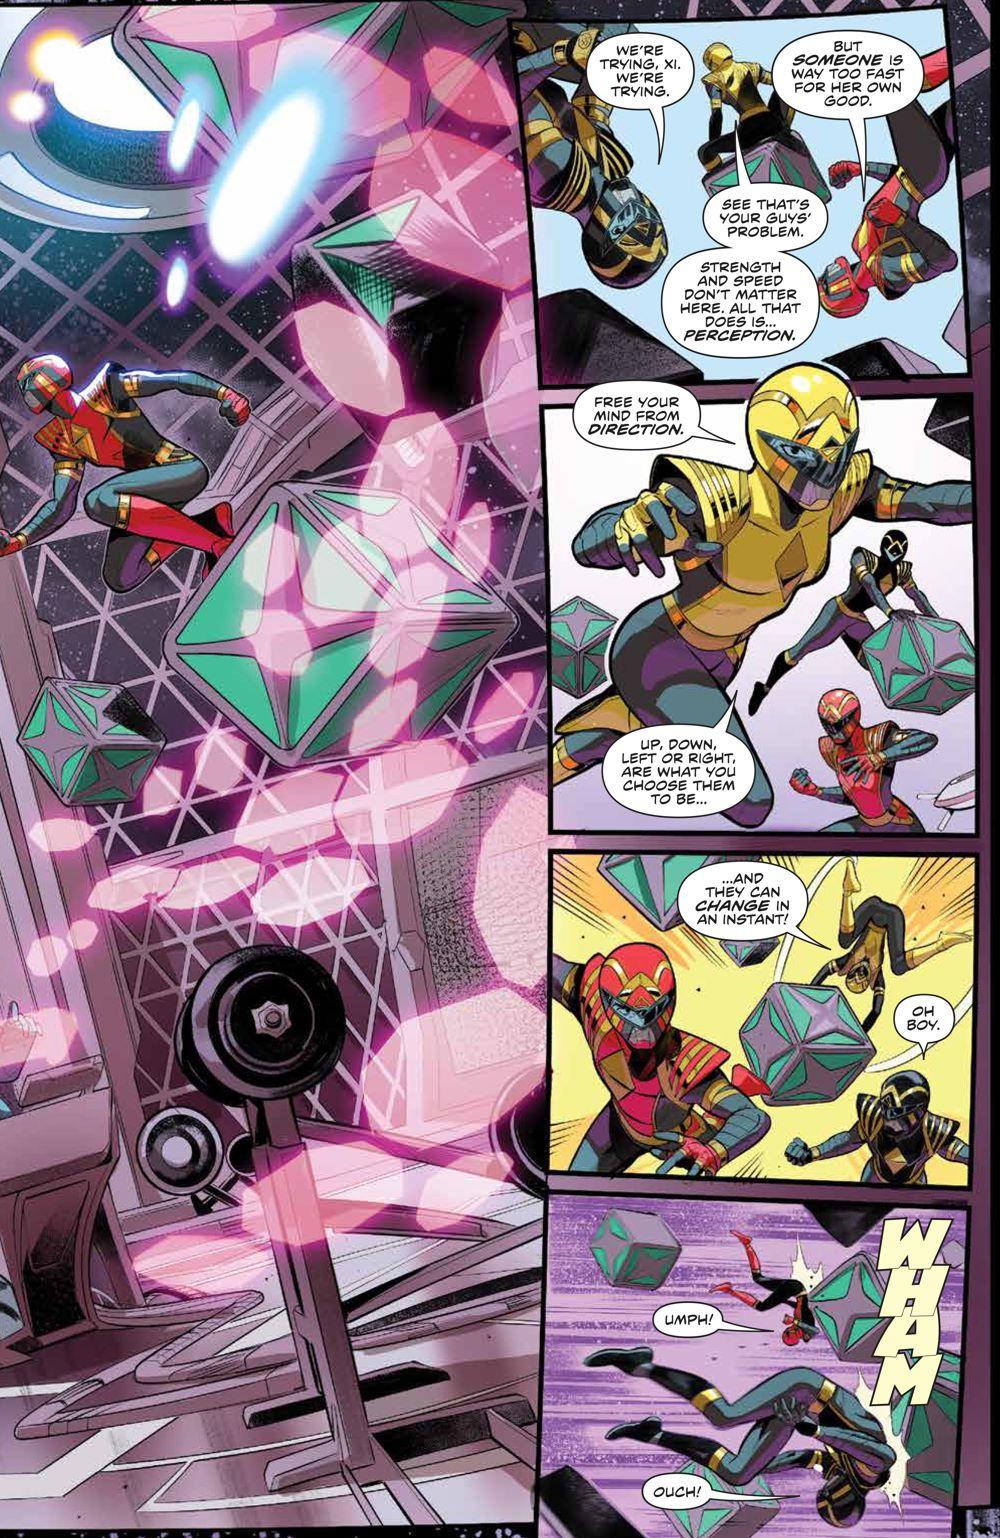 PowerRangers_v1_SC_PRESS_9 ComicList Previews: POWER RANGERS VOLUME 1 TP